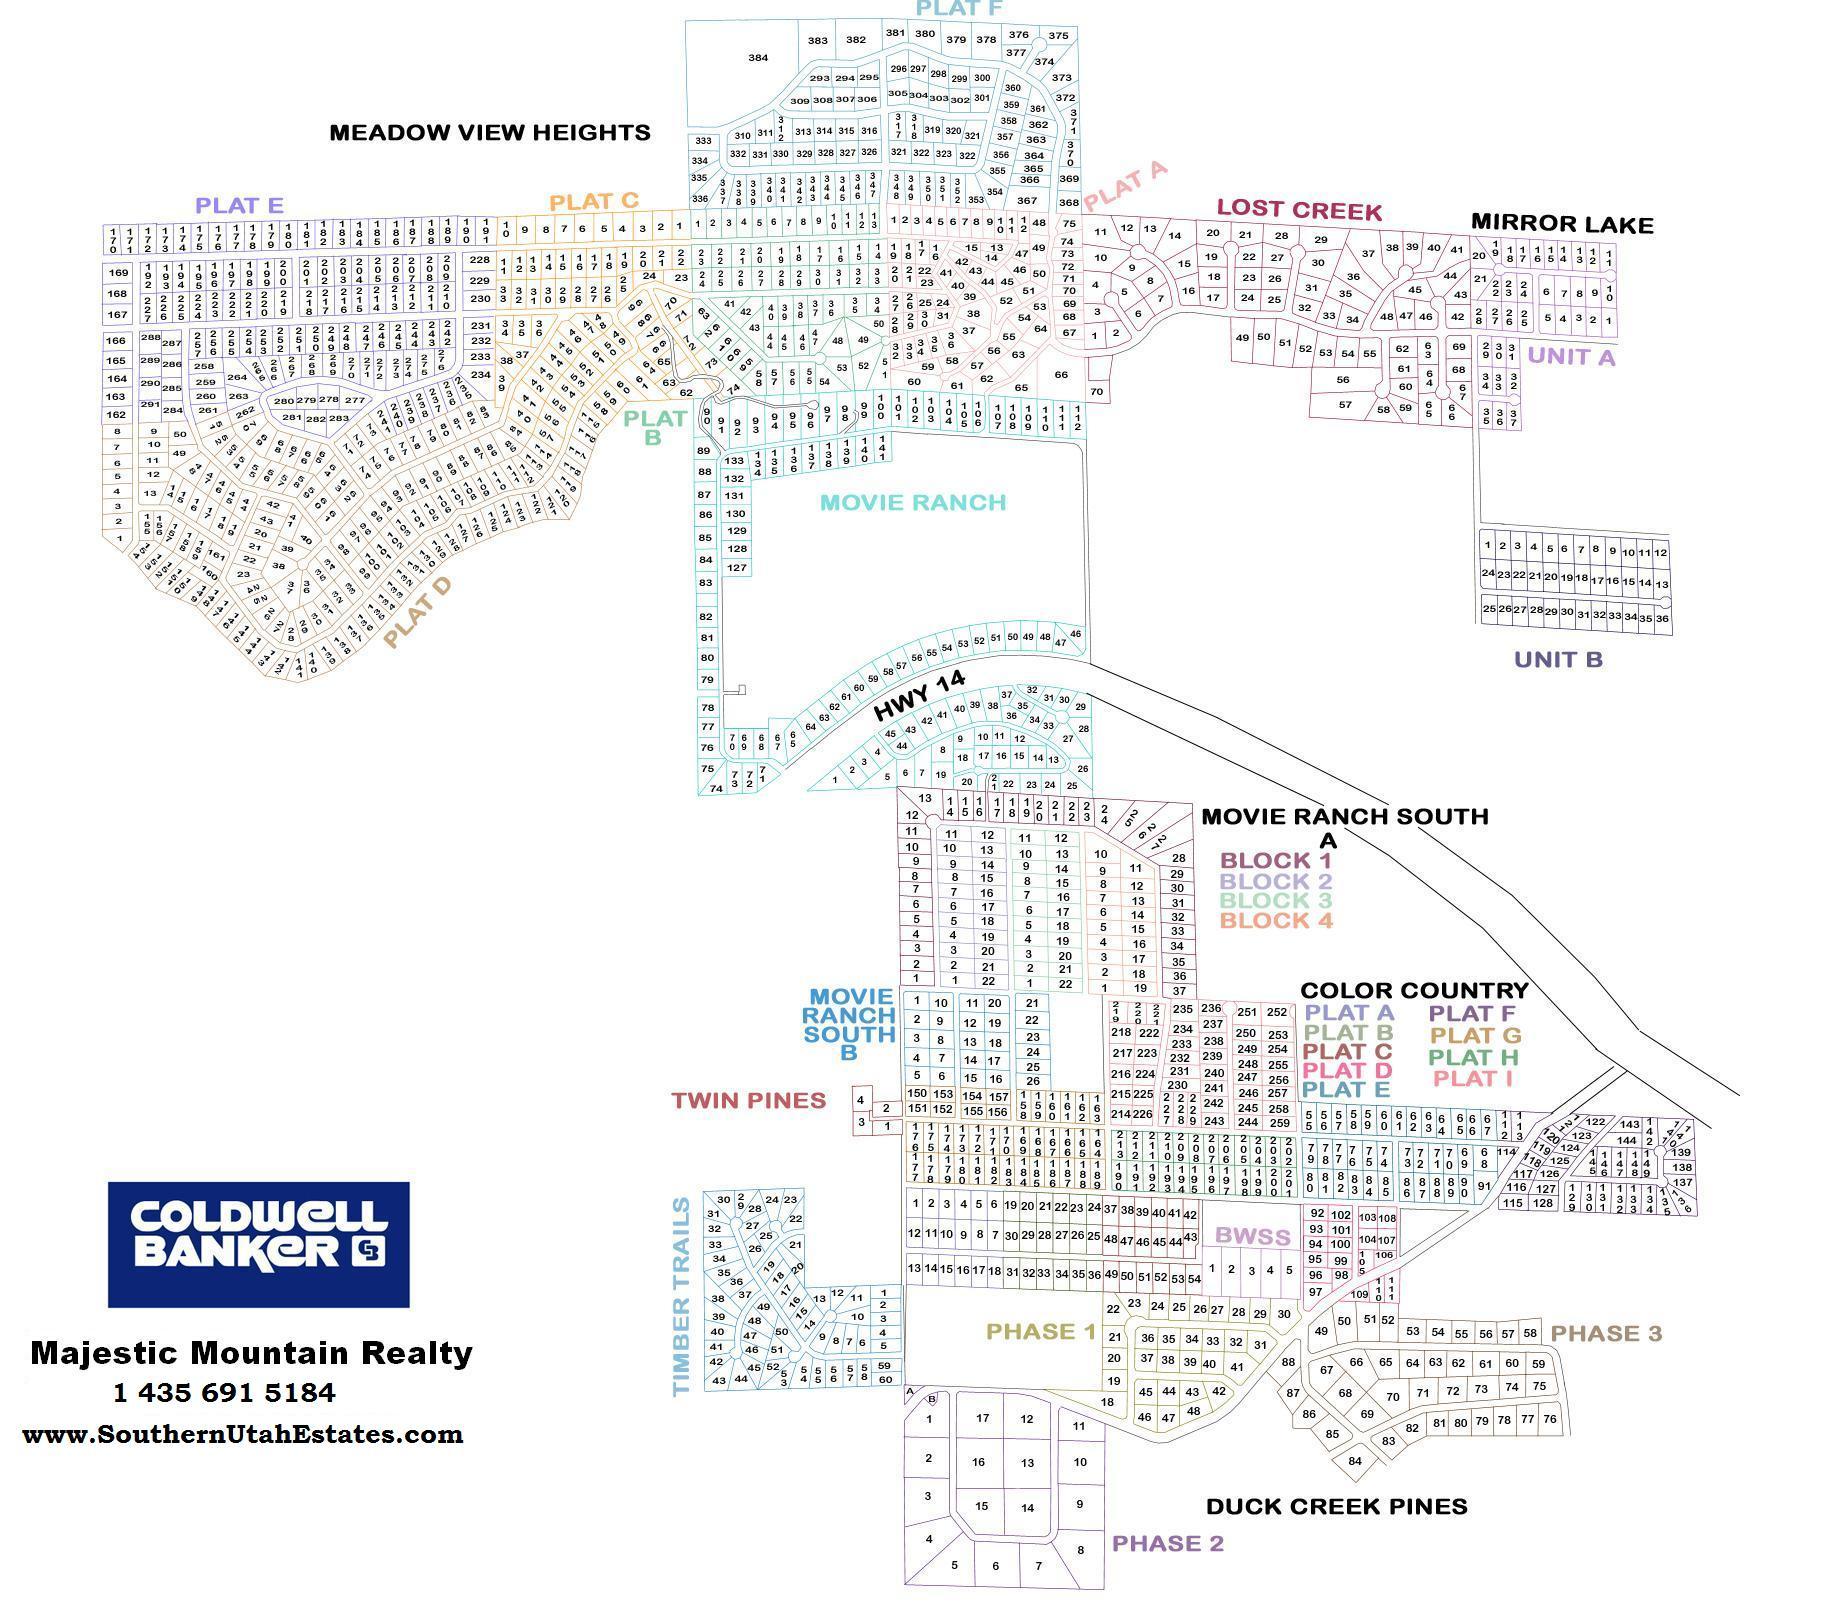 Duck Creek Village Utah >> Southern Utah Real Estate, Area Maps For the Cedar City area mountains